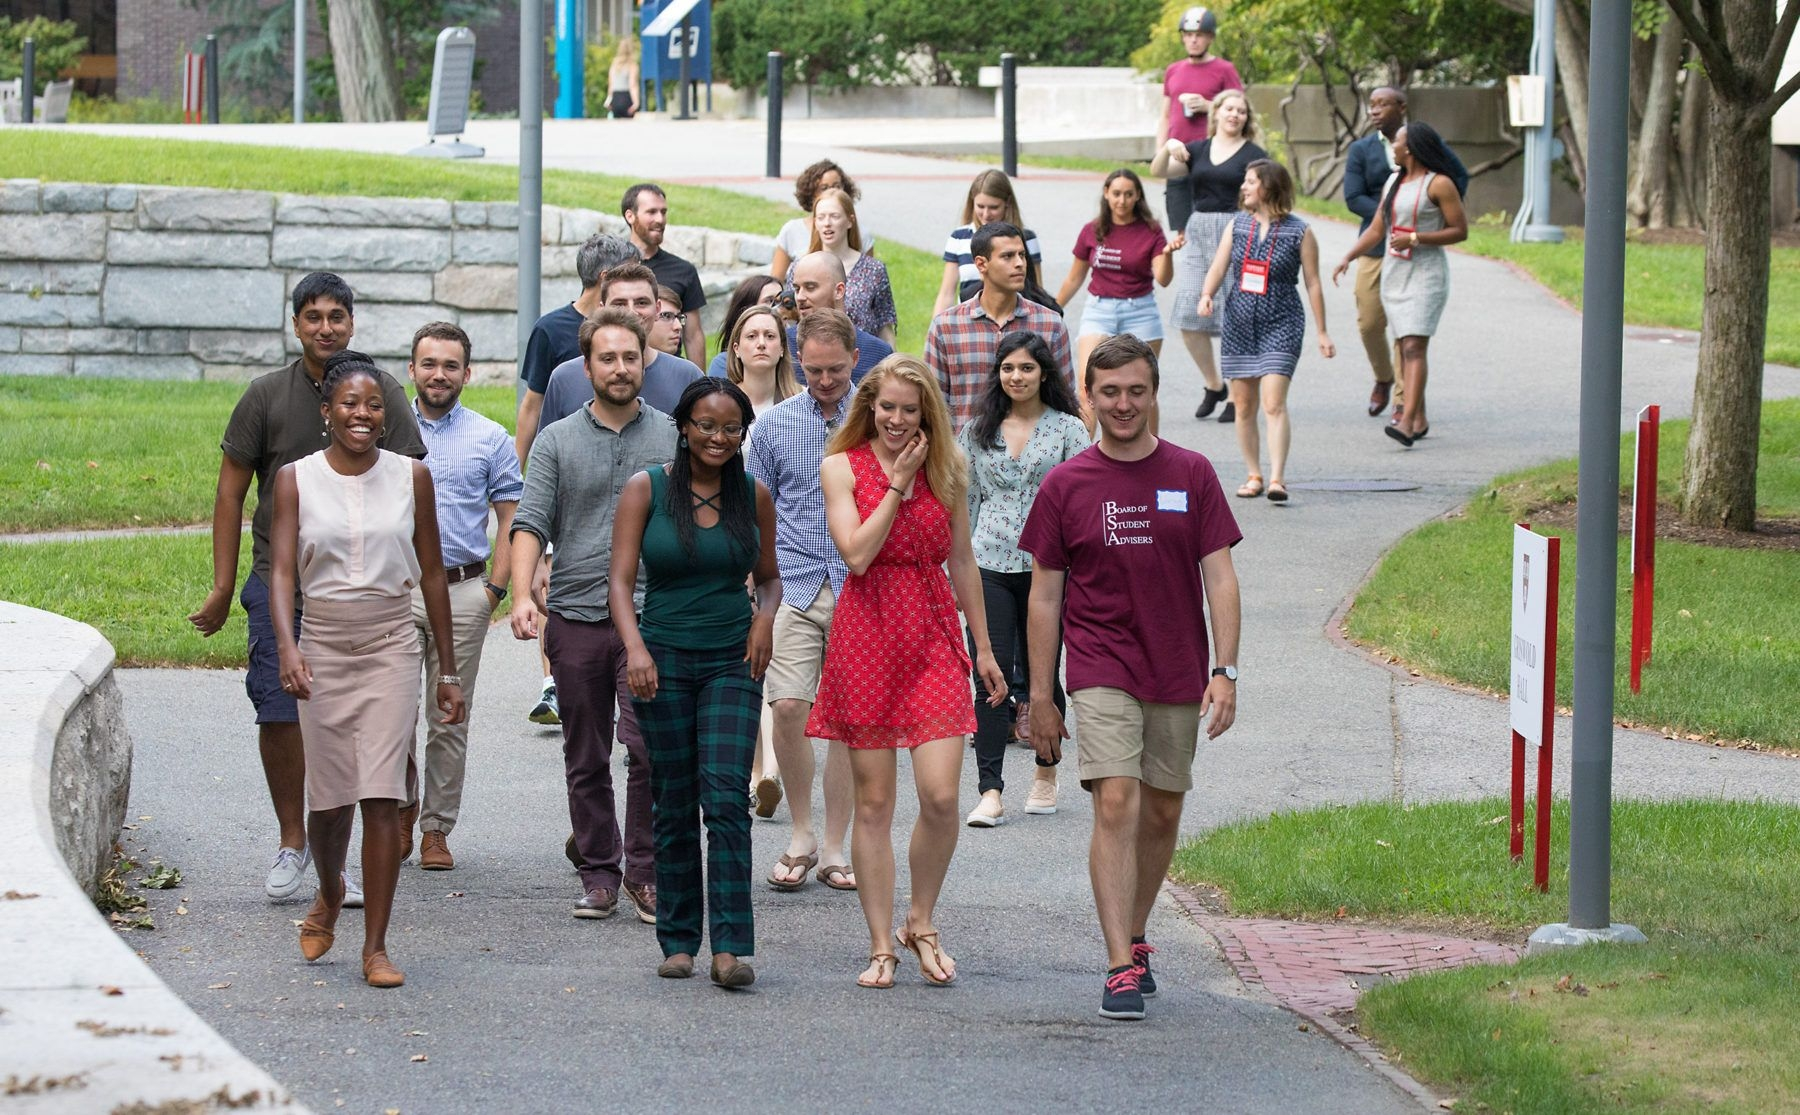 Harvard Law School Welcomes The Class Of 2021! - Harvard Law